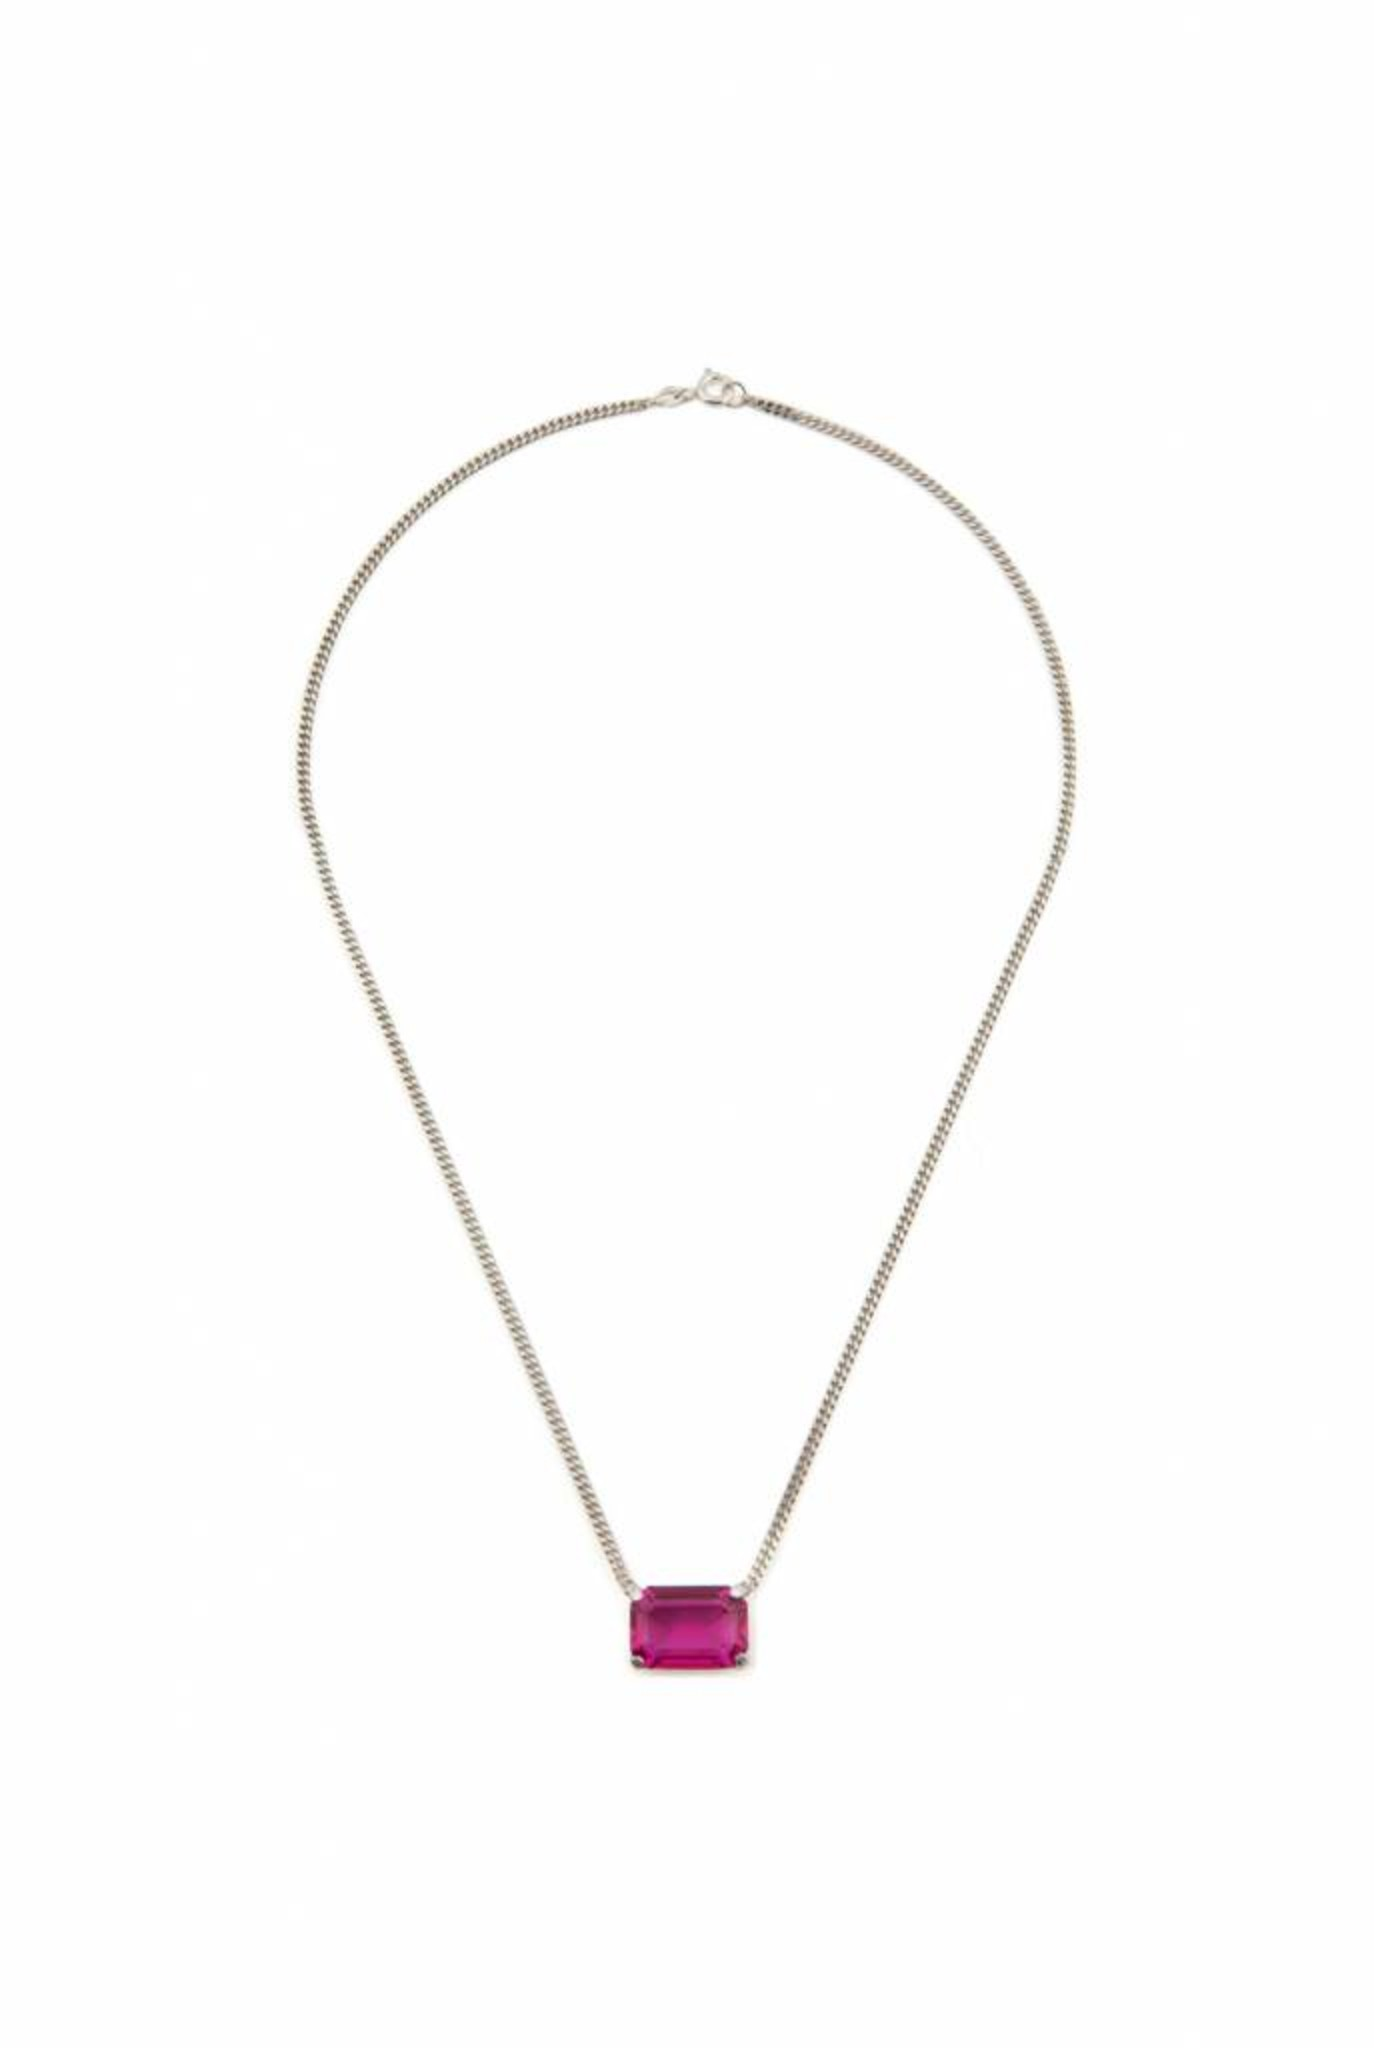 Necklace silver rectangle fuchsia corundum